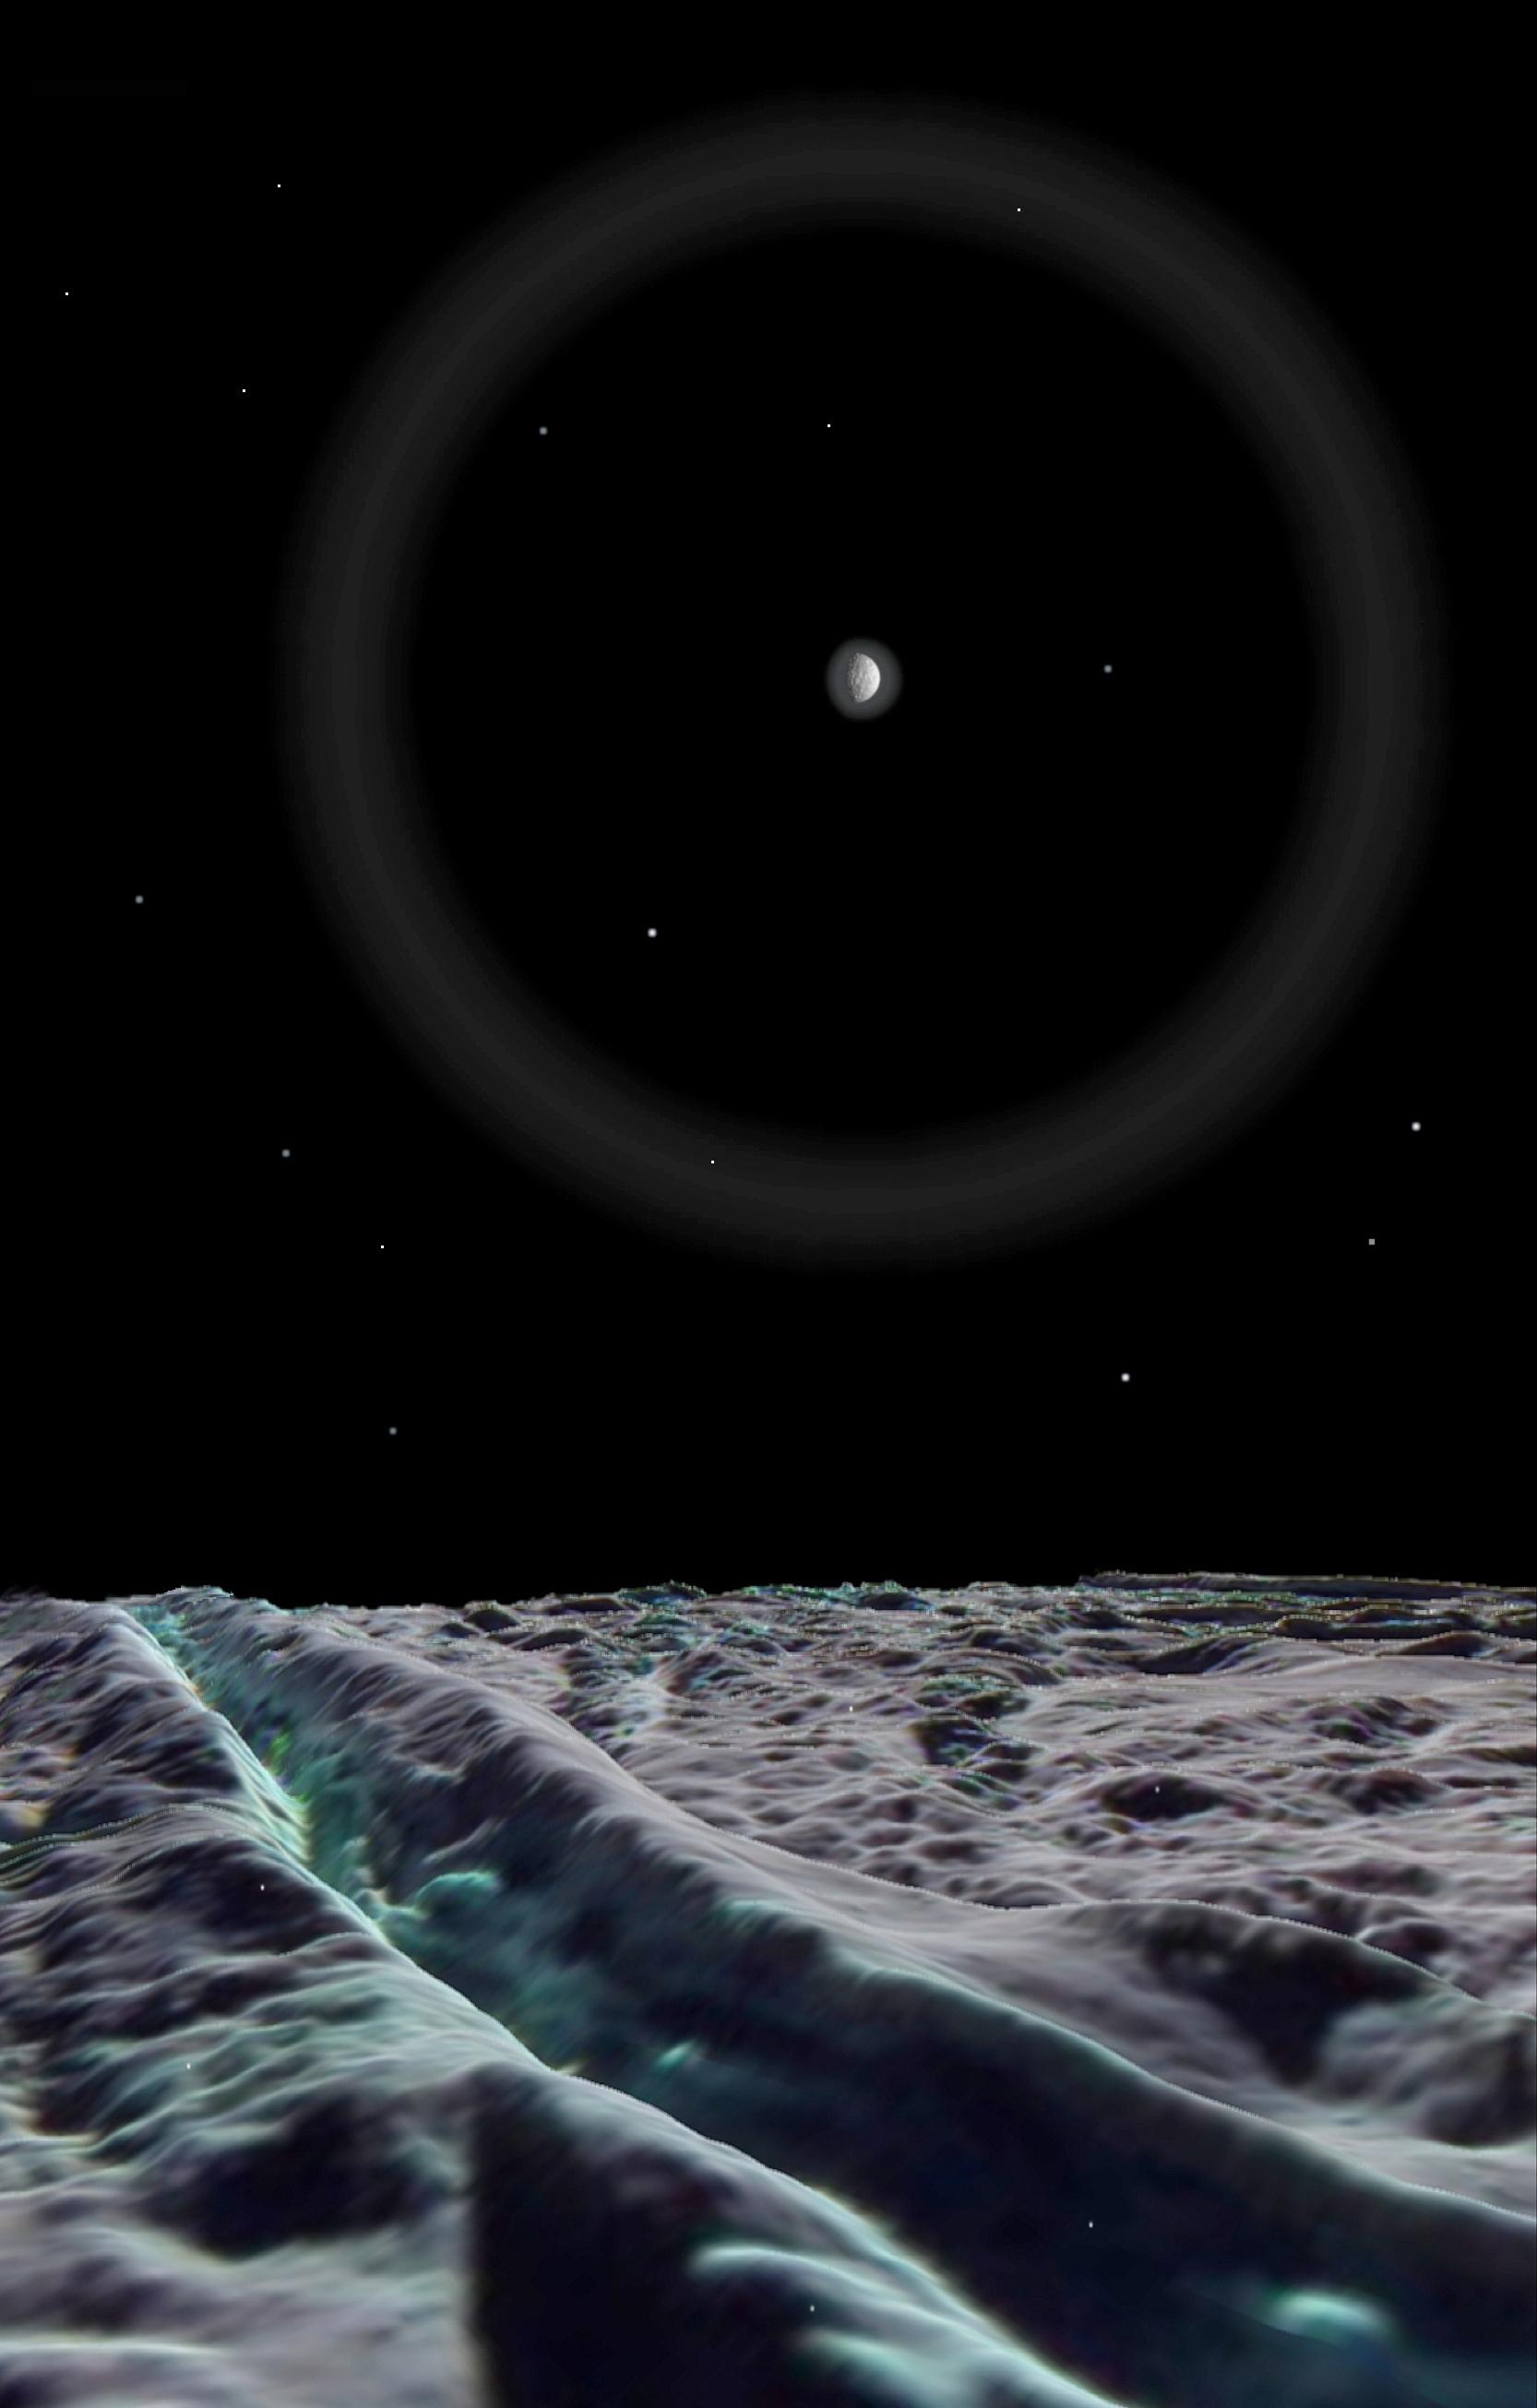 Enceladus Moon Surface The Surface of Enceladus